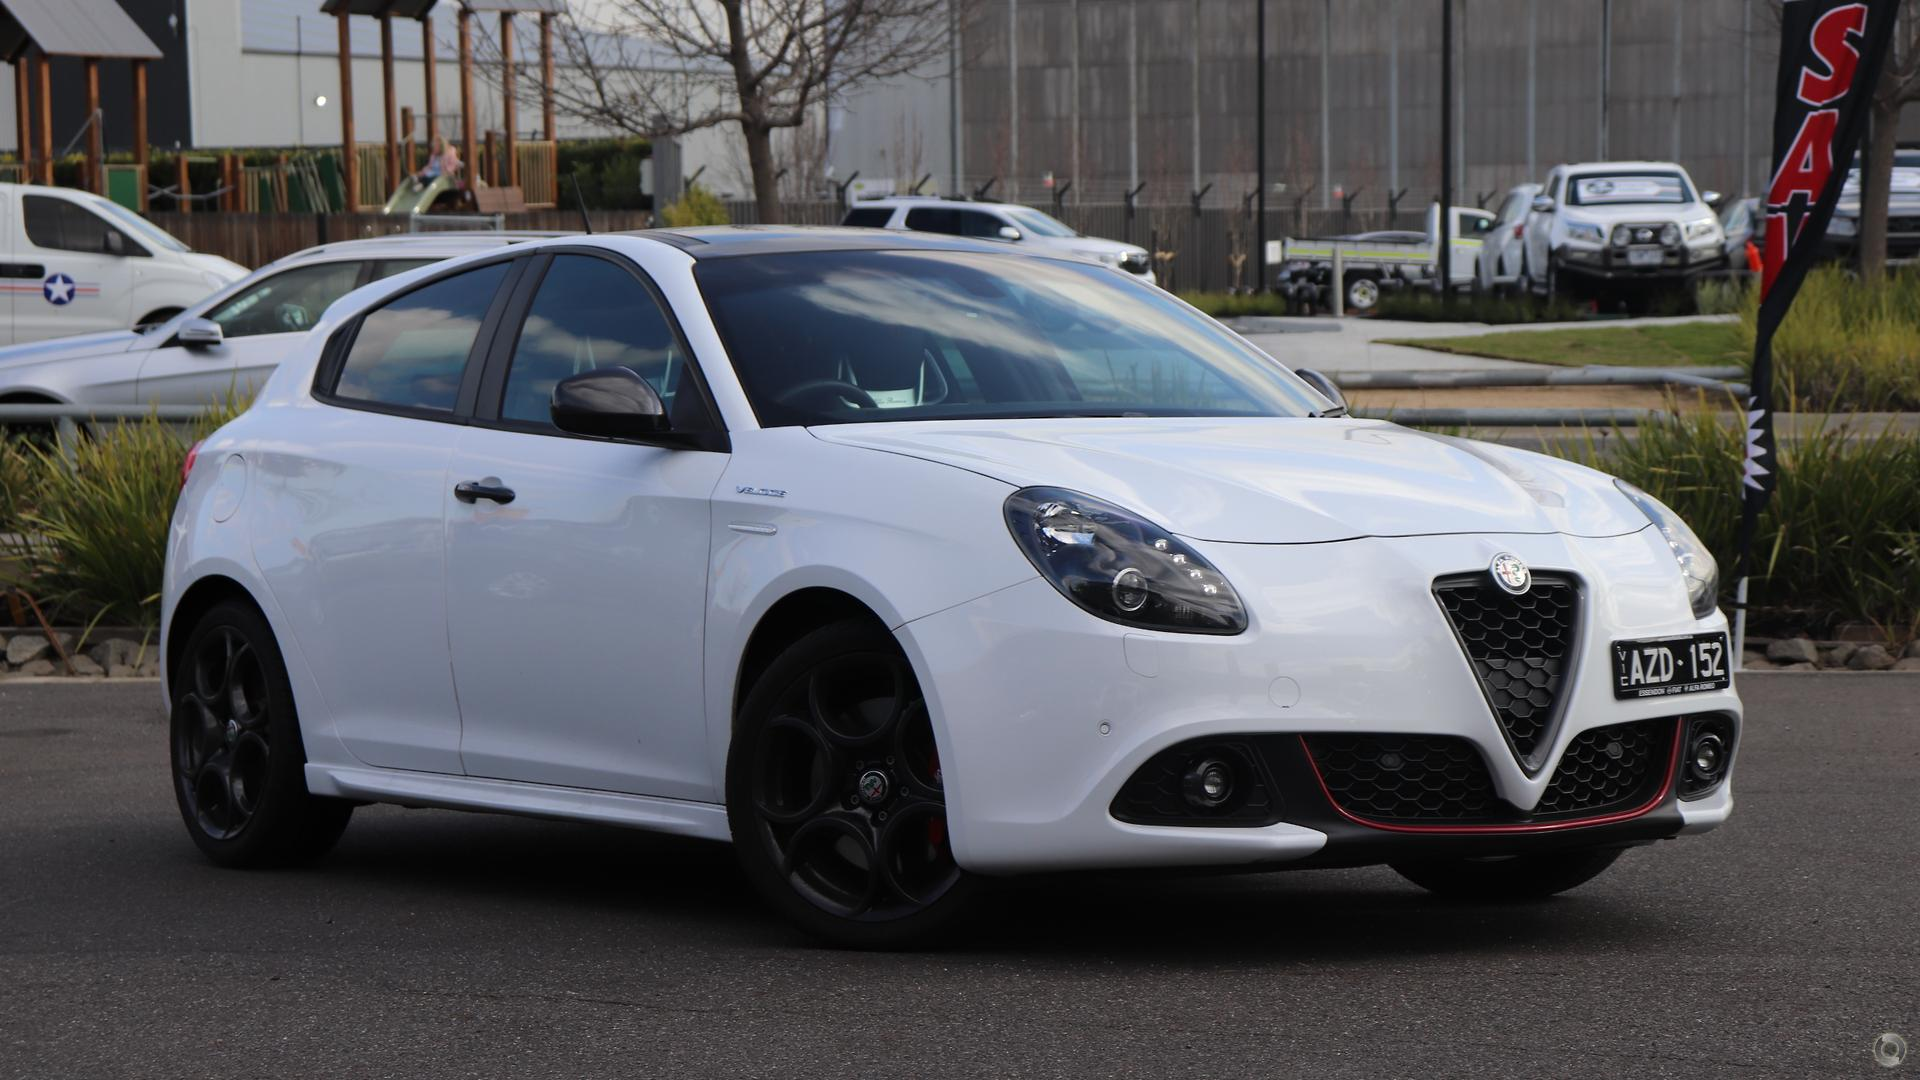 2019 Alfa Romeo Giulietta Series 2